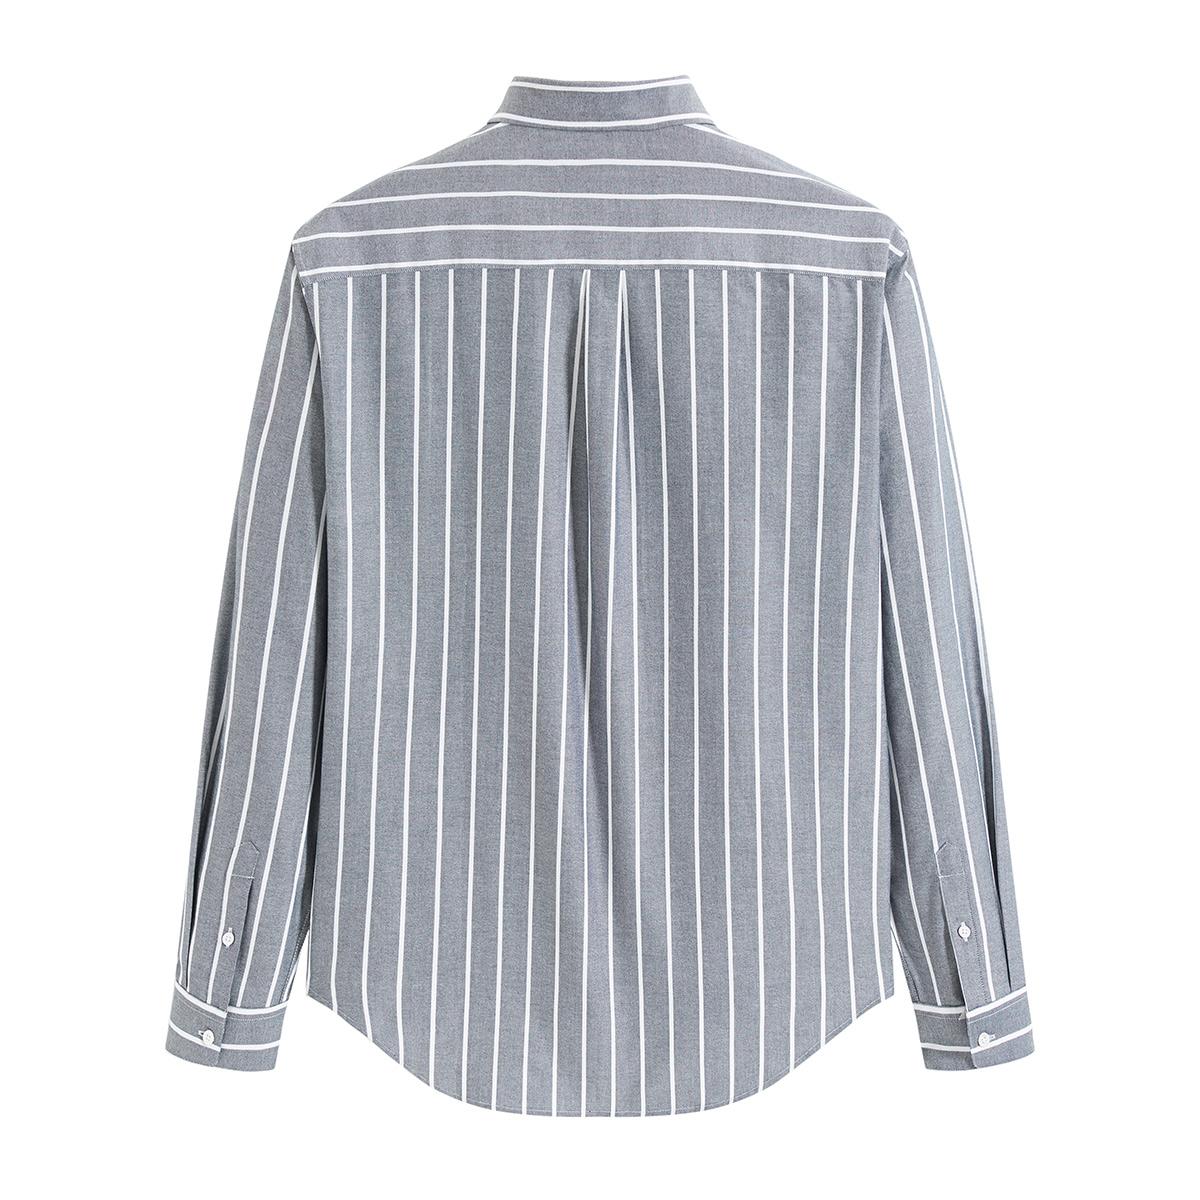 01c2b42d2ef ... striped long-sleeved shirt Shirt · Zoom · lightbox moreview · lightbox  moreview ...